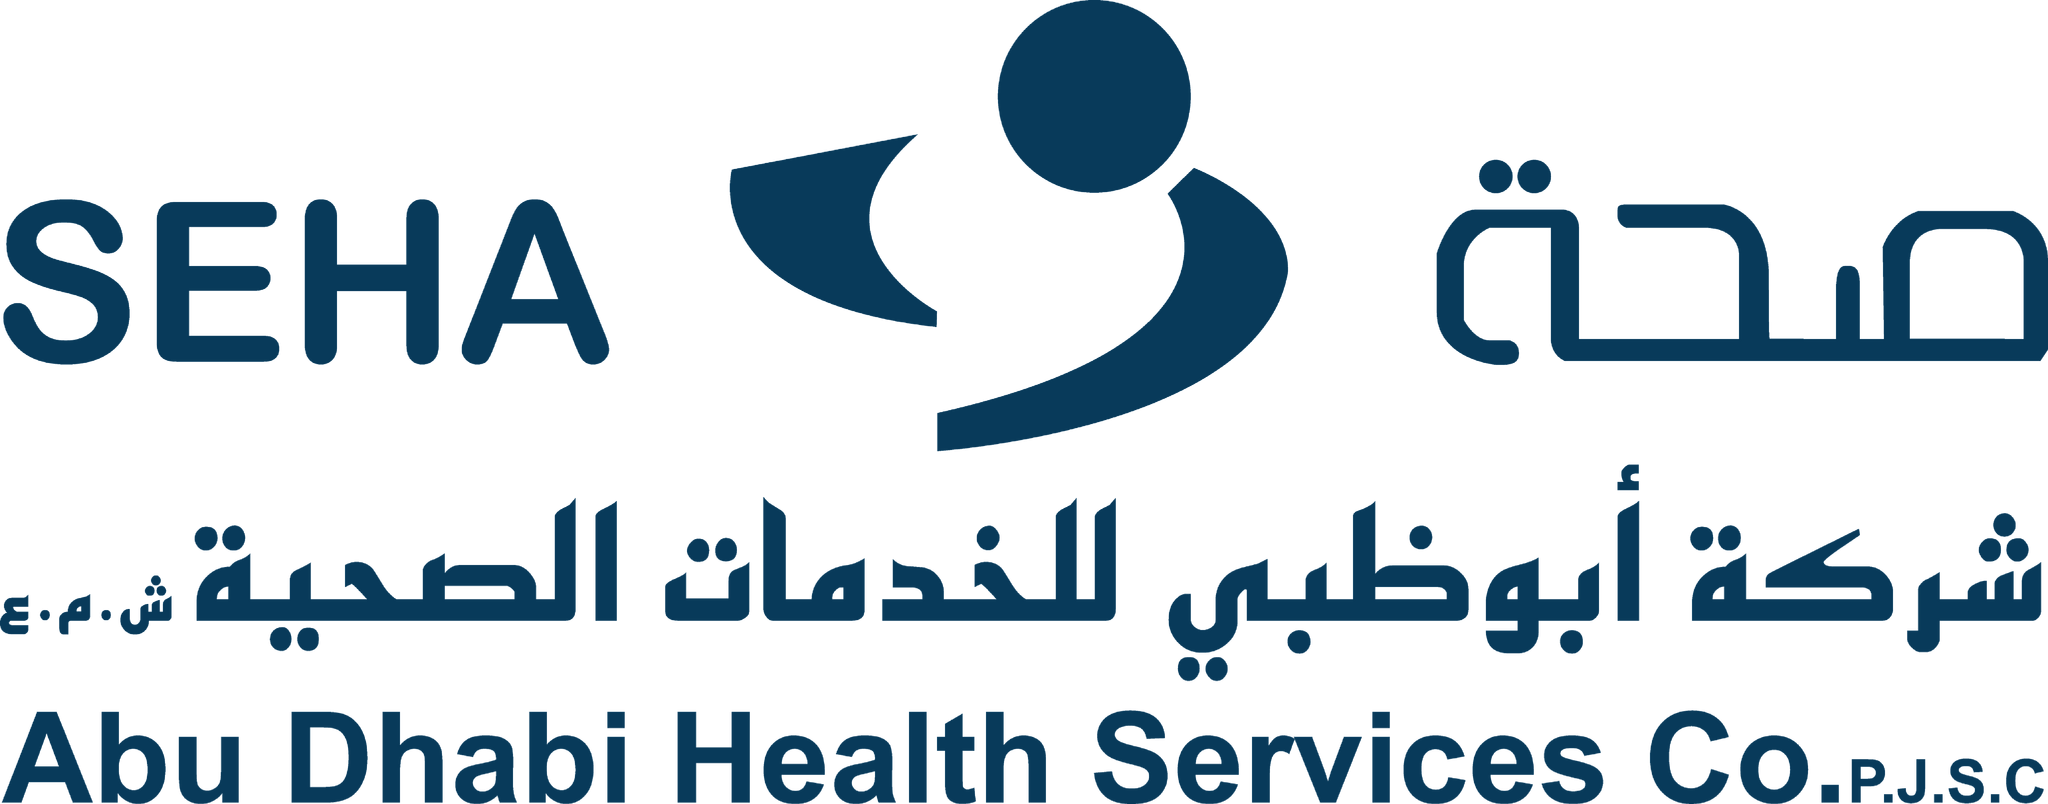 Abu Dhabi Health Services, Co. (SEHA)